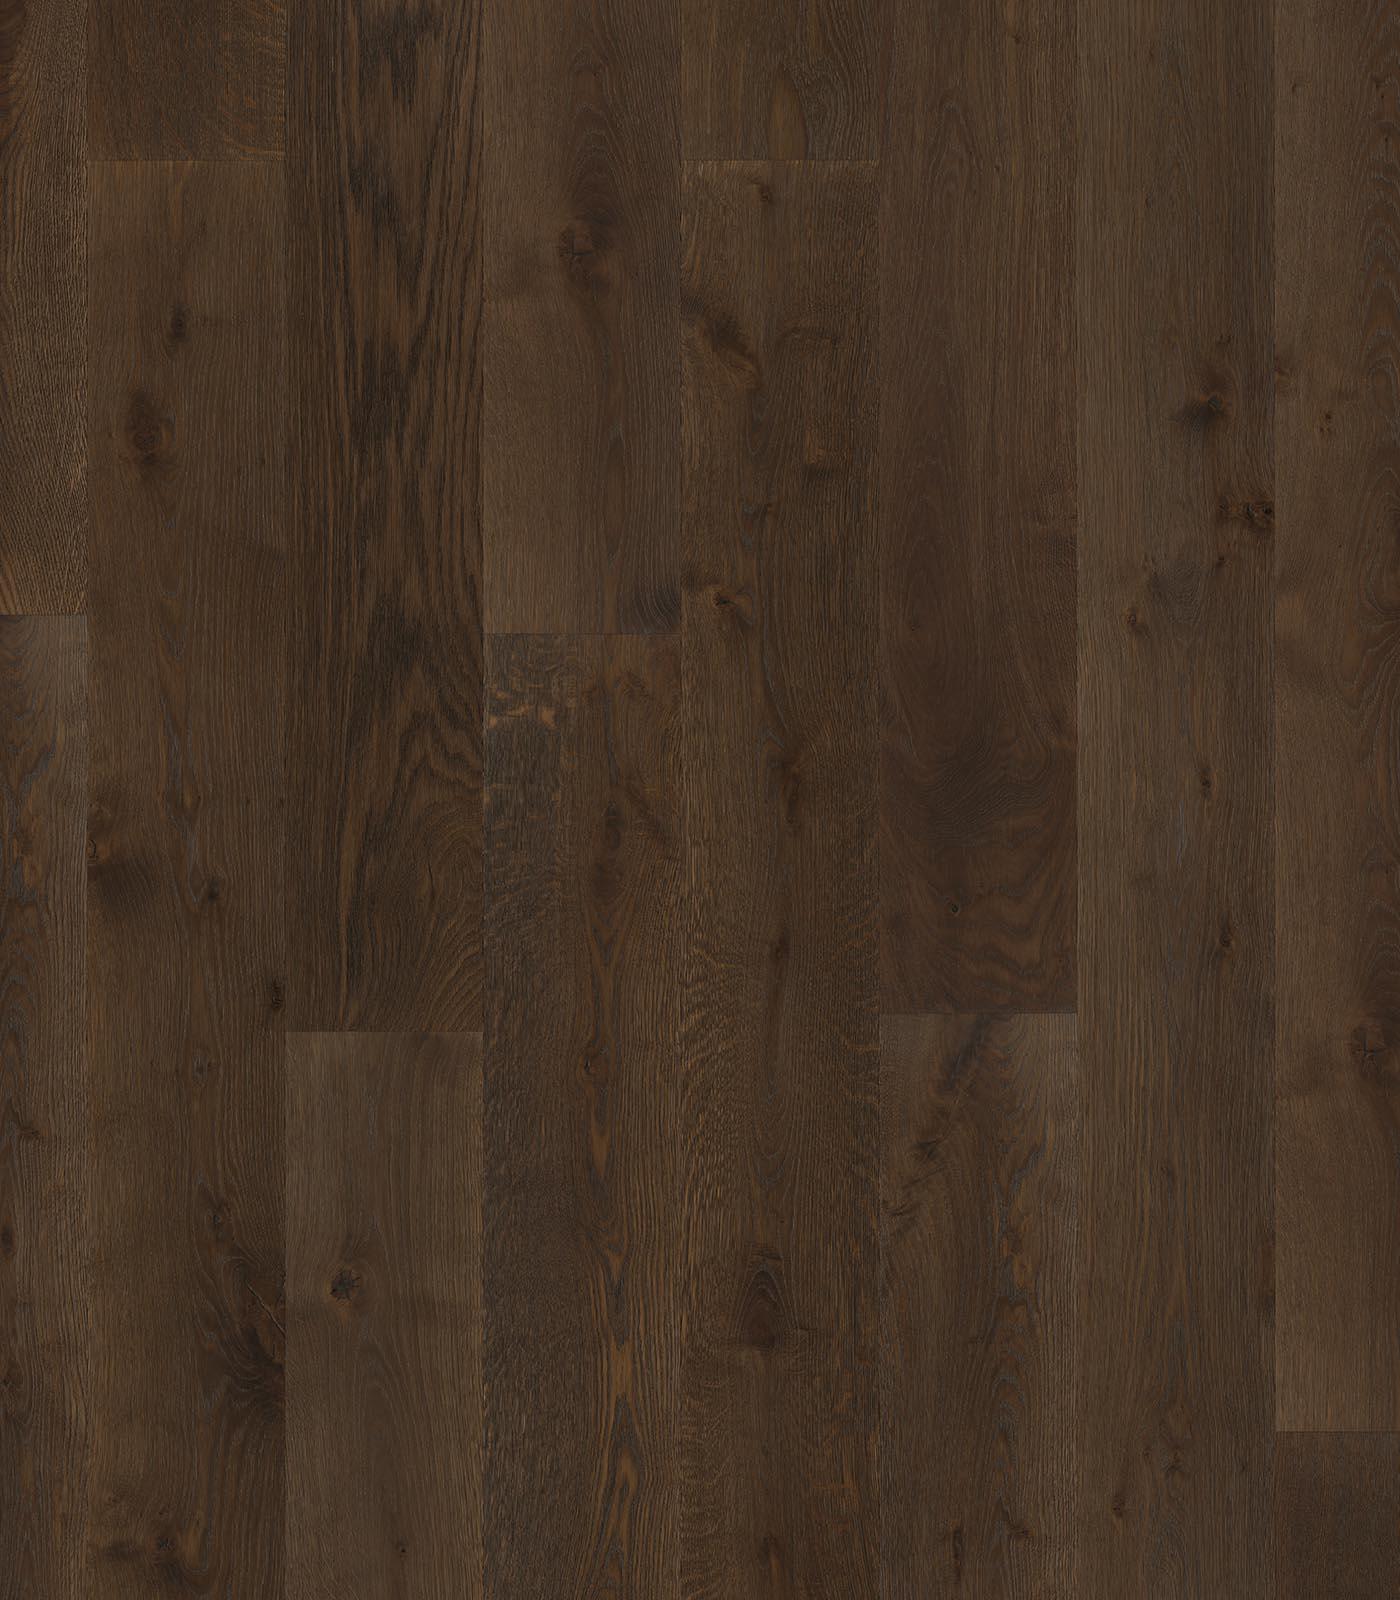 Costa Rica-Lifestyle Collection- European Oak Floors-flat